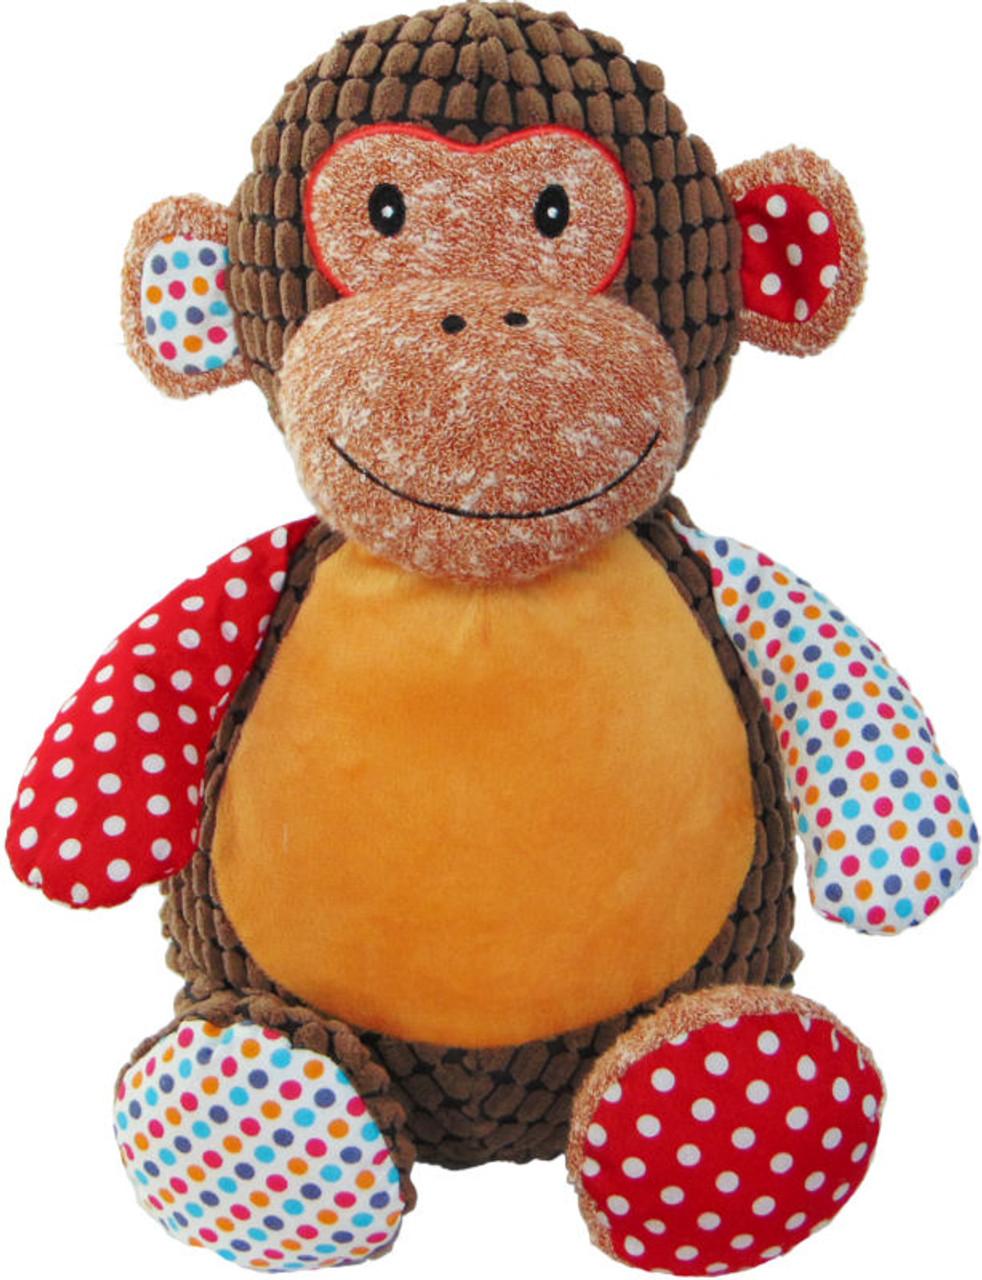 Cubbies Customization Plush Toys